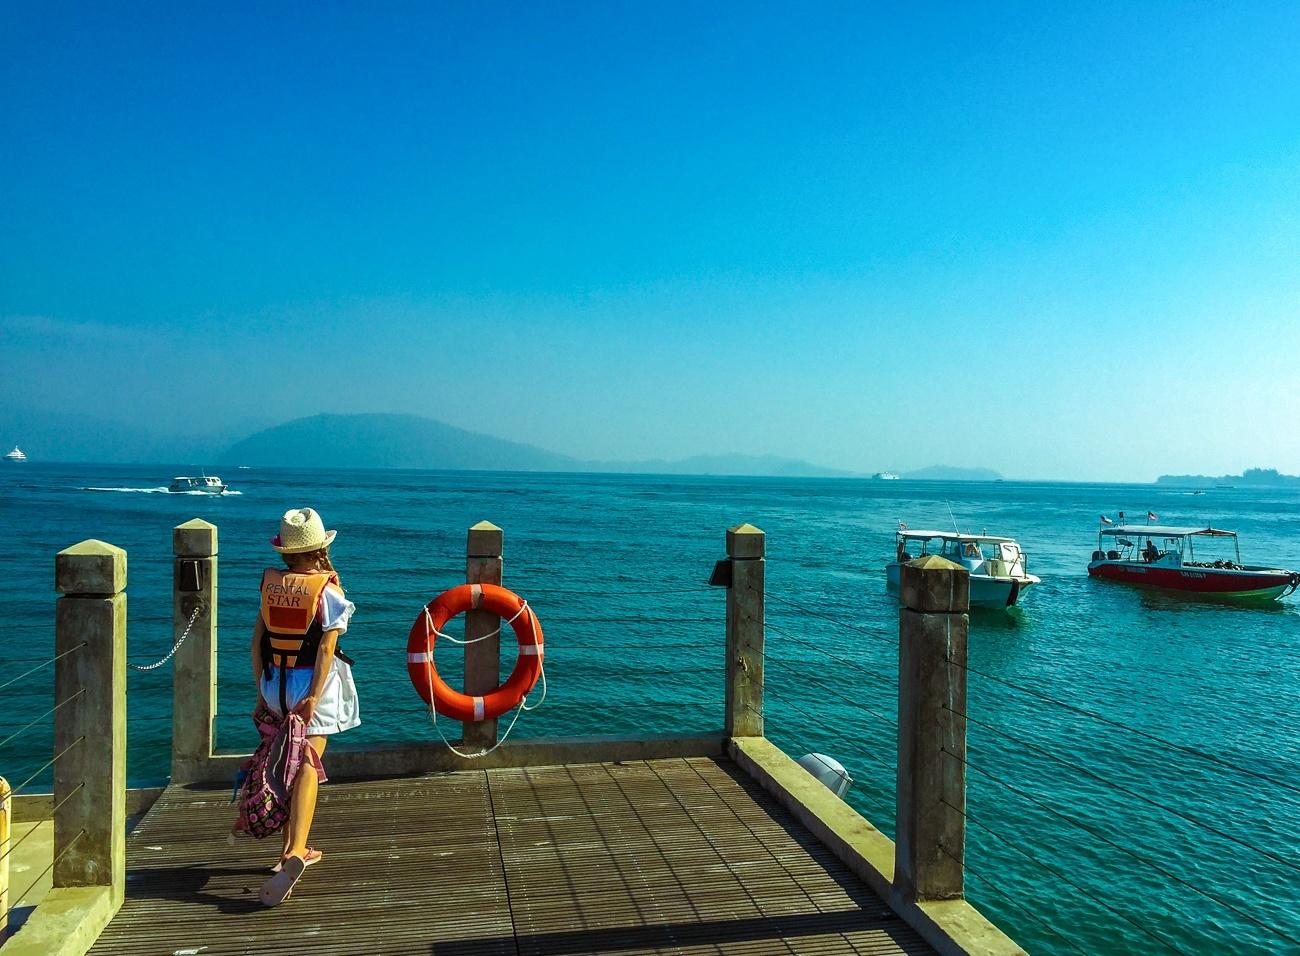 The private STAR Marina jetty at Shangri-la's Tanjung Aru Resort and Spa, Kota Kinabalu